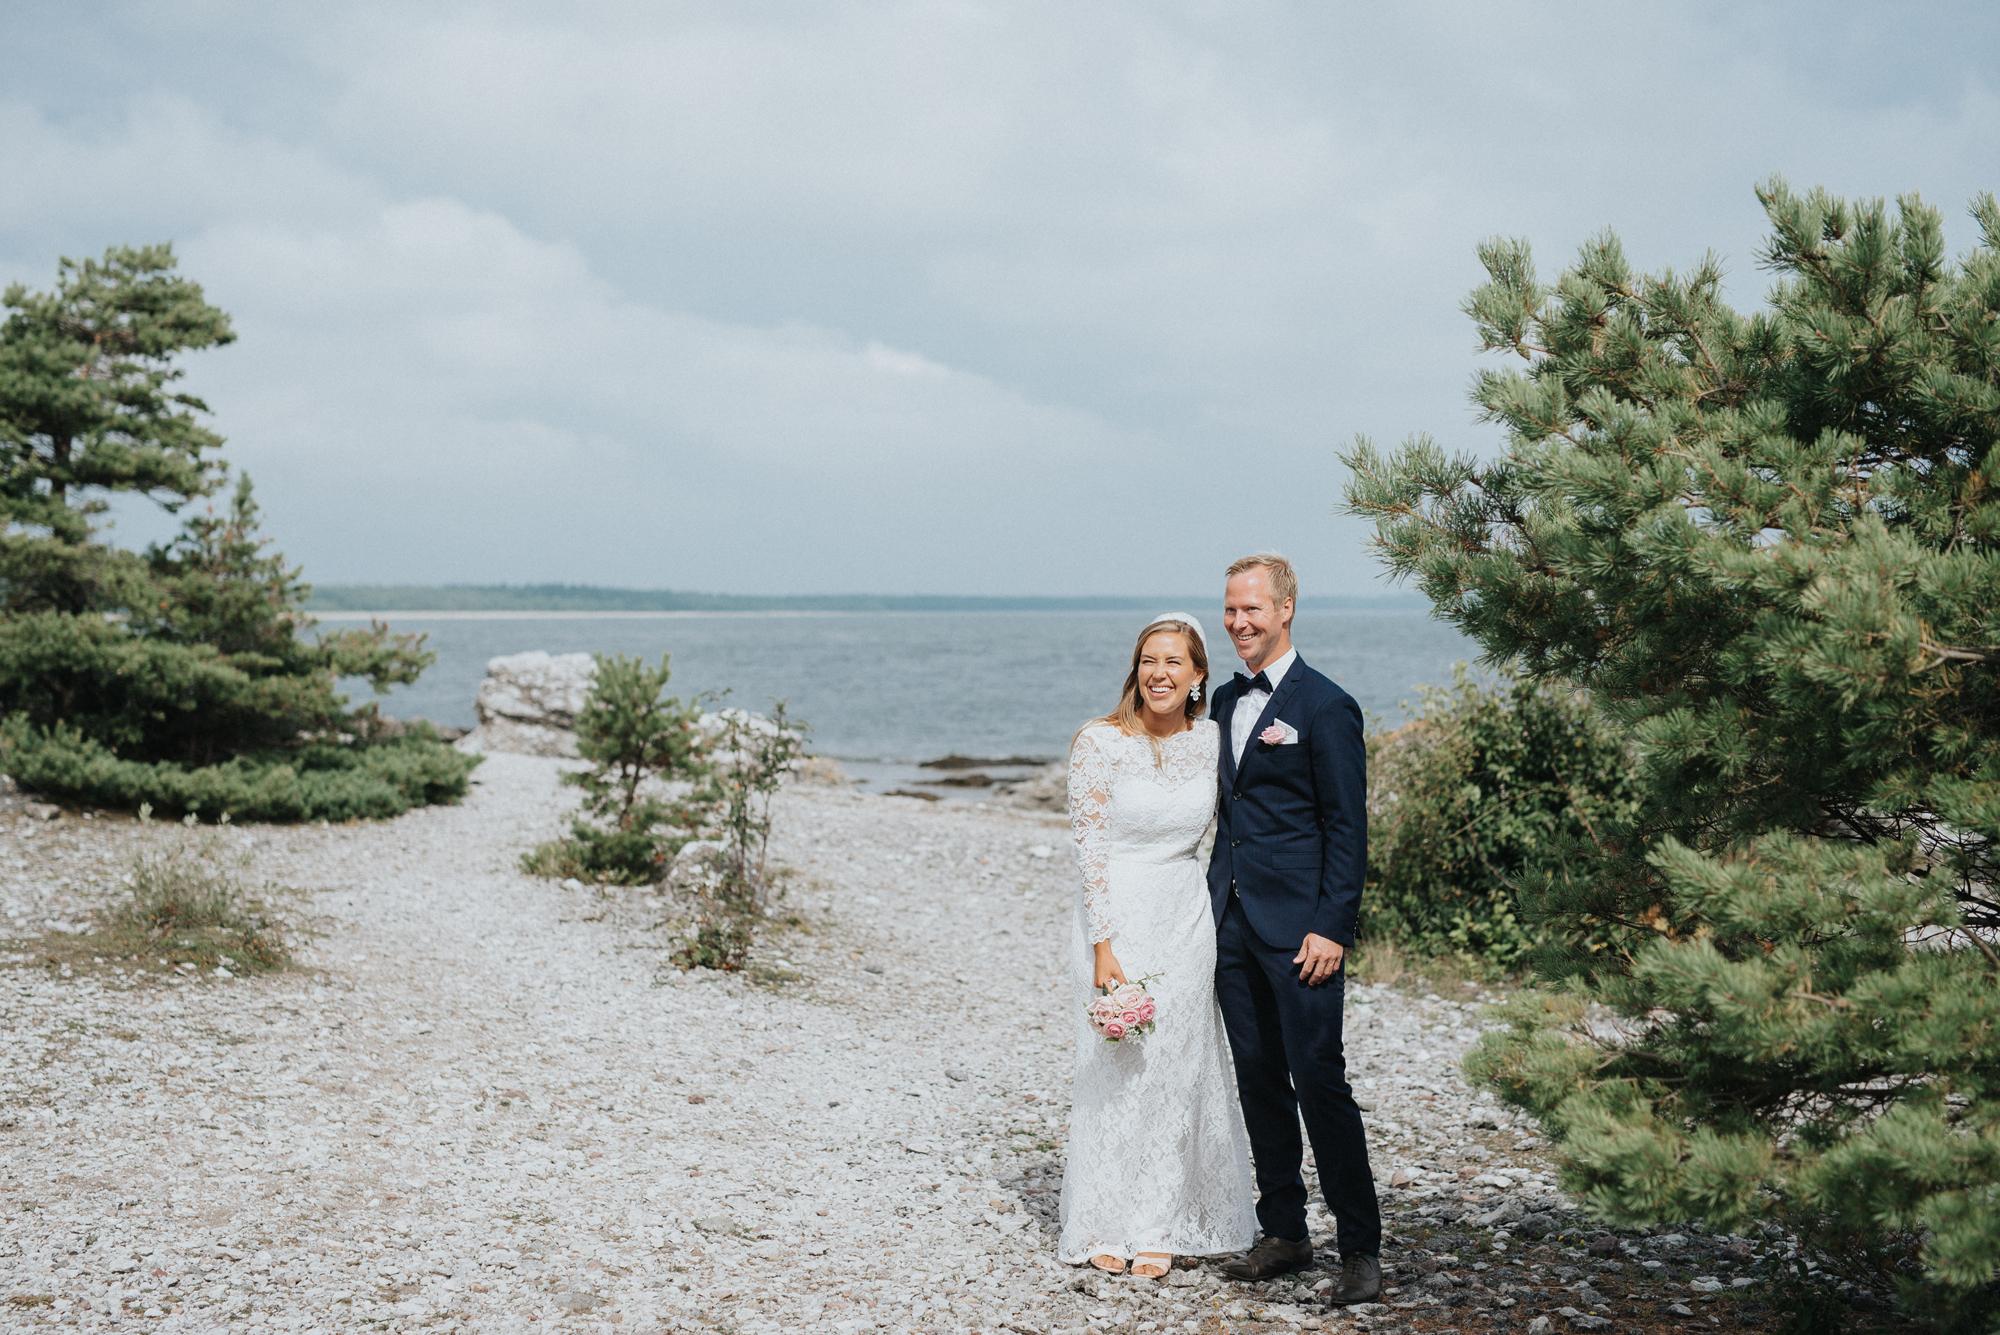 023-bröllopsfotograf-folhammar-gotland-neas-fotografi.jpg